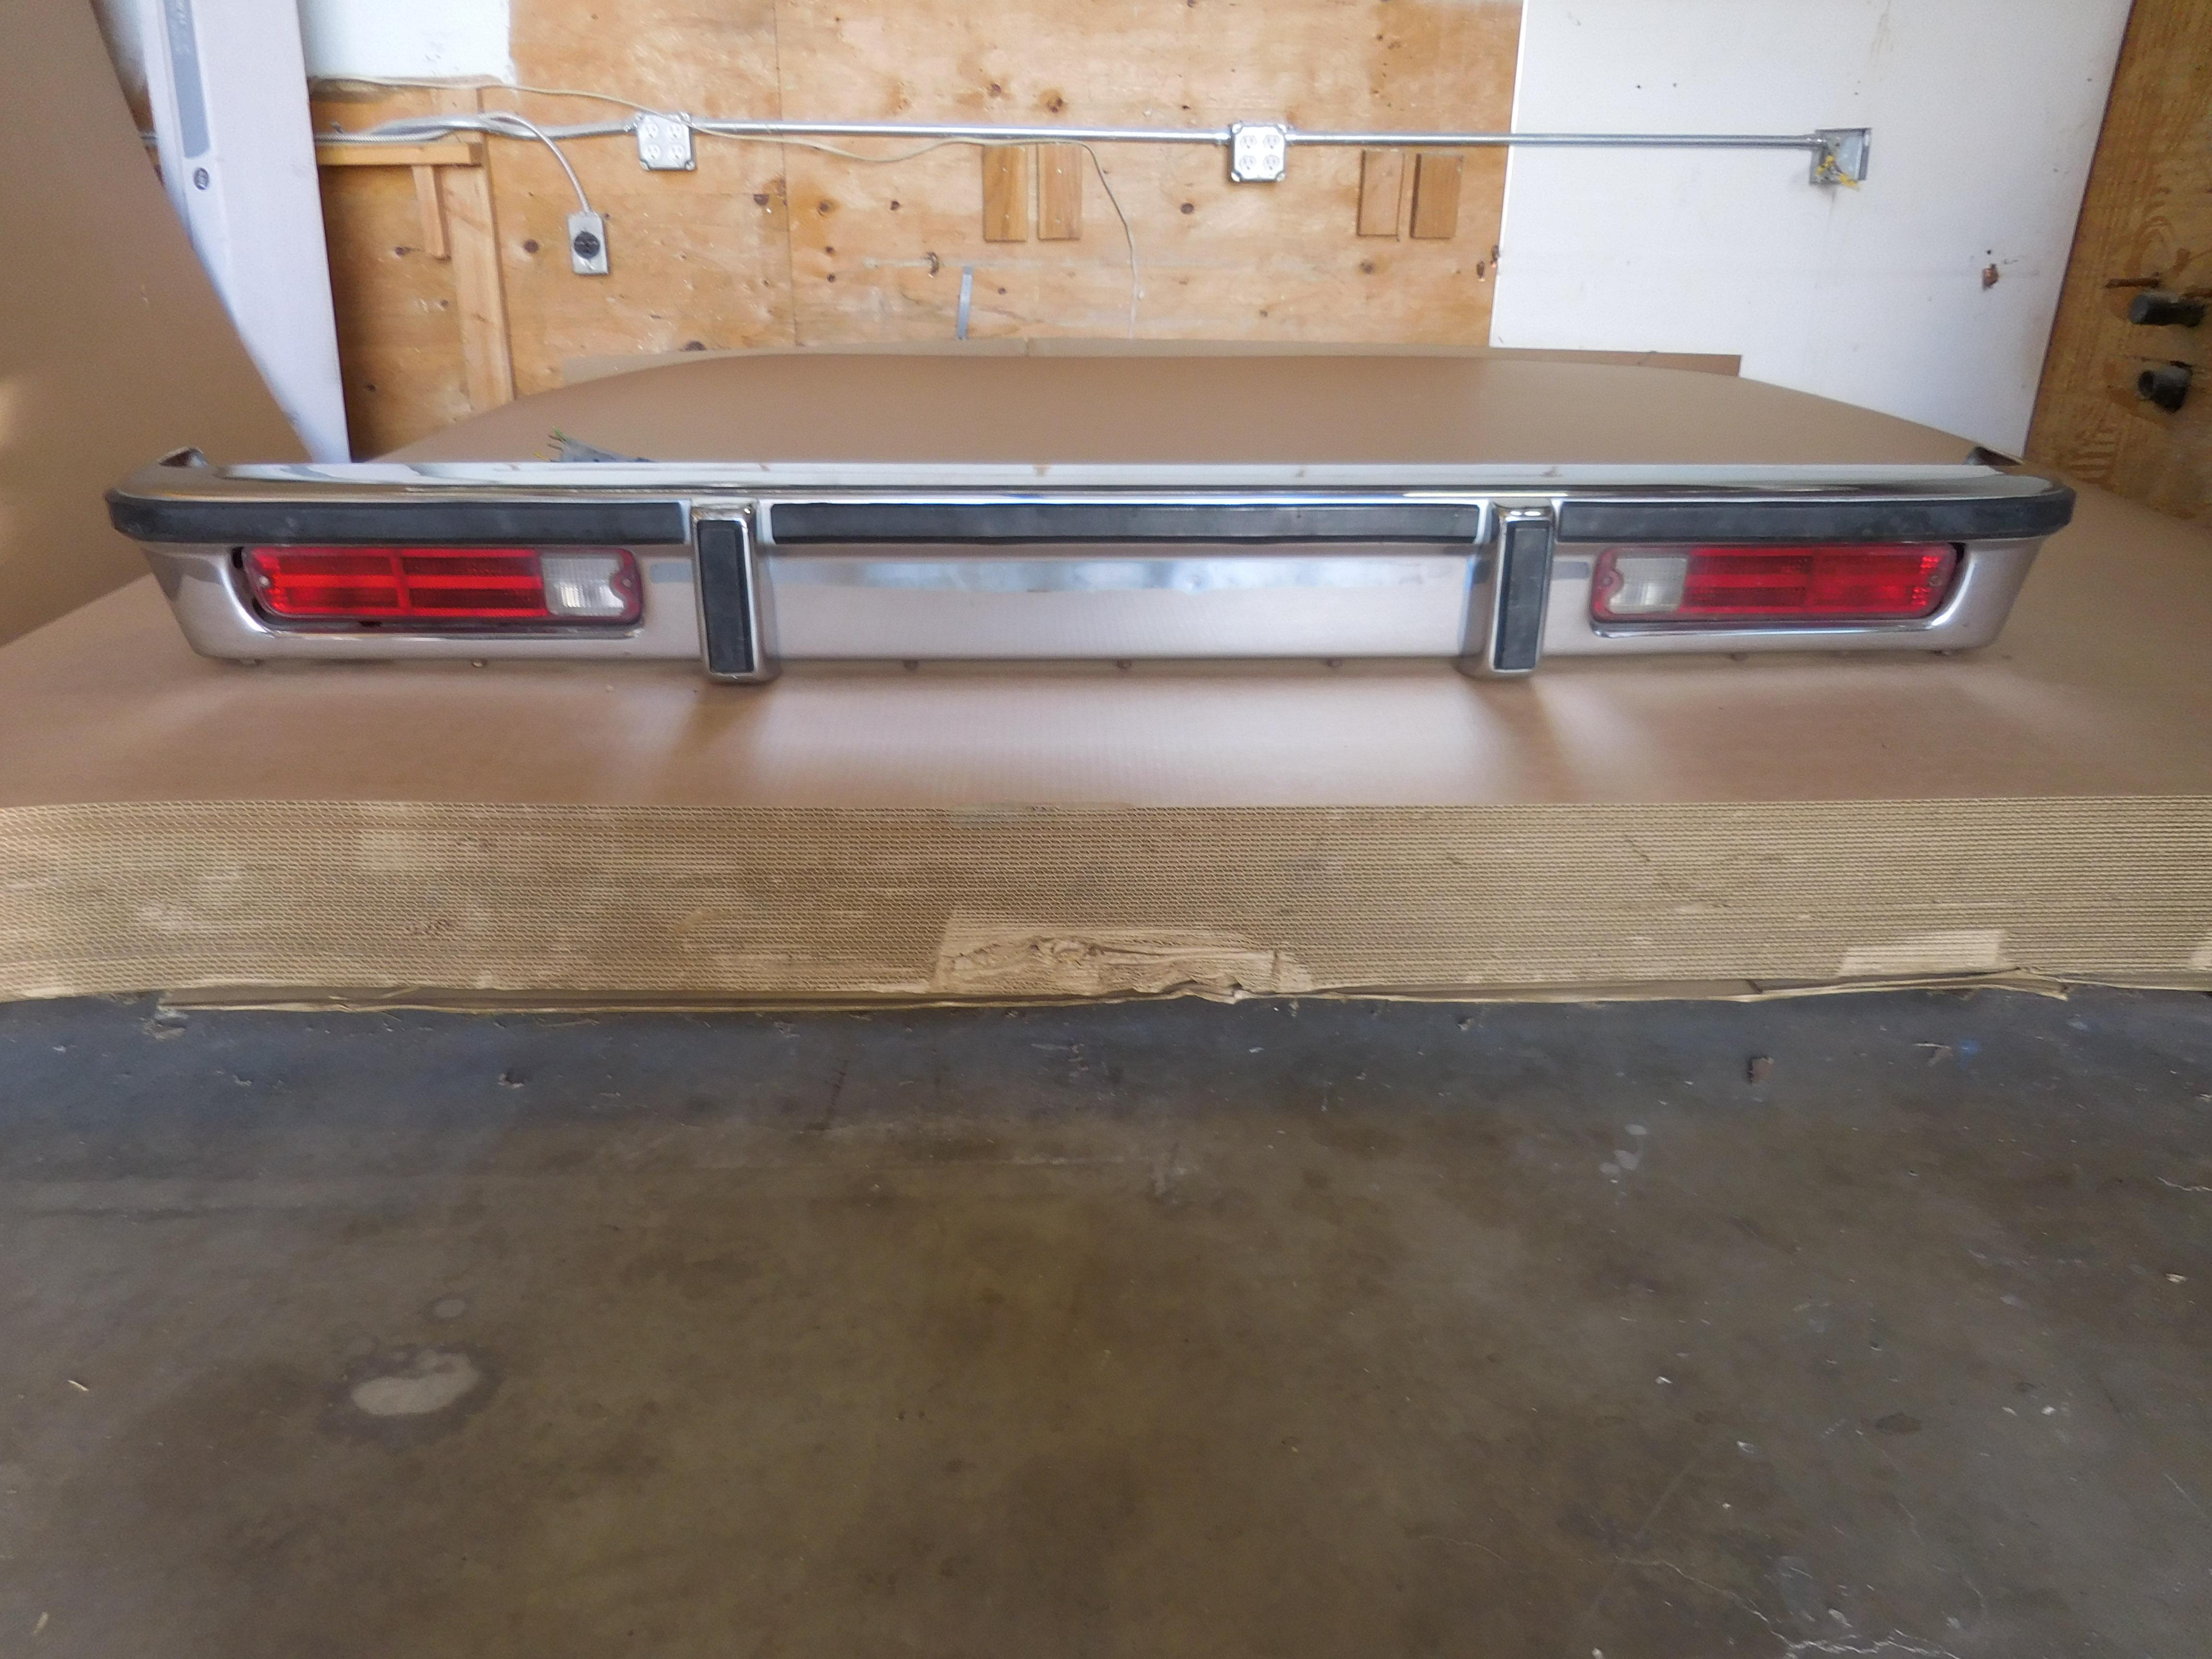 1987 Buick Regal For Sale >> 1978-1988 Chevrolet El Camino Caballero Rear Bumper | GM ...